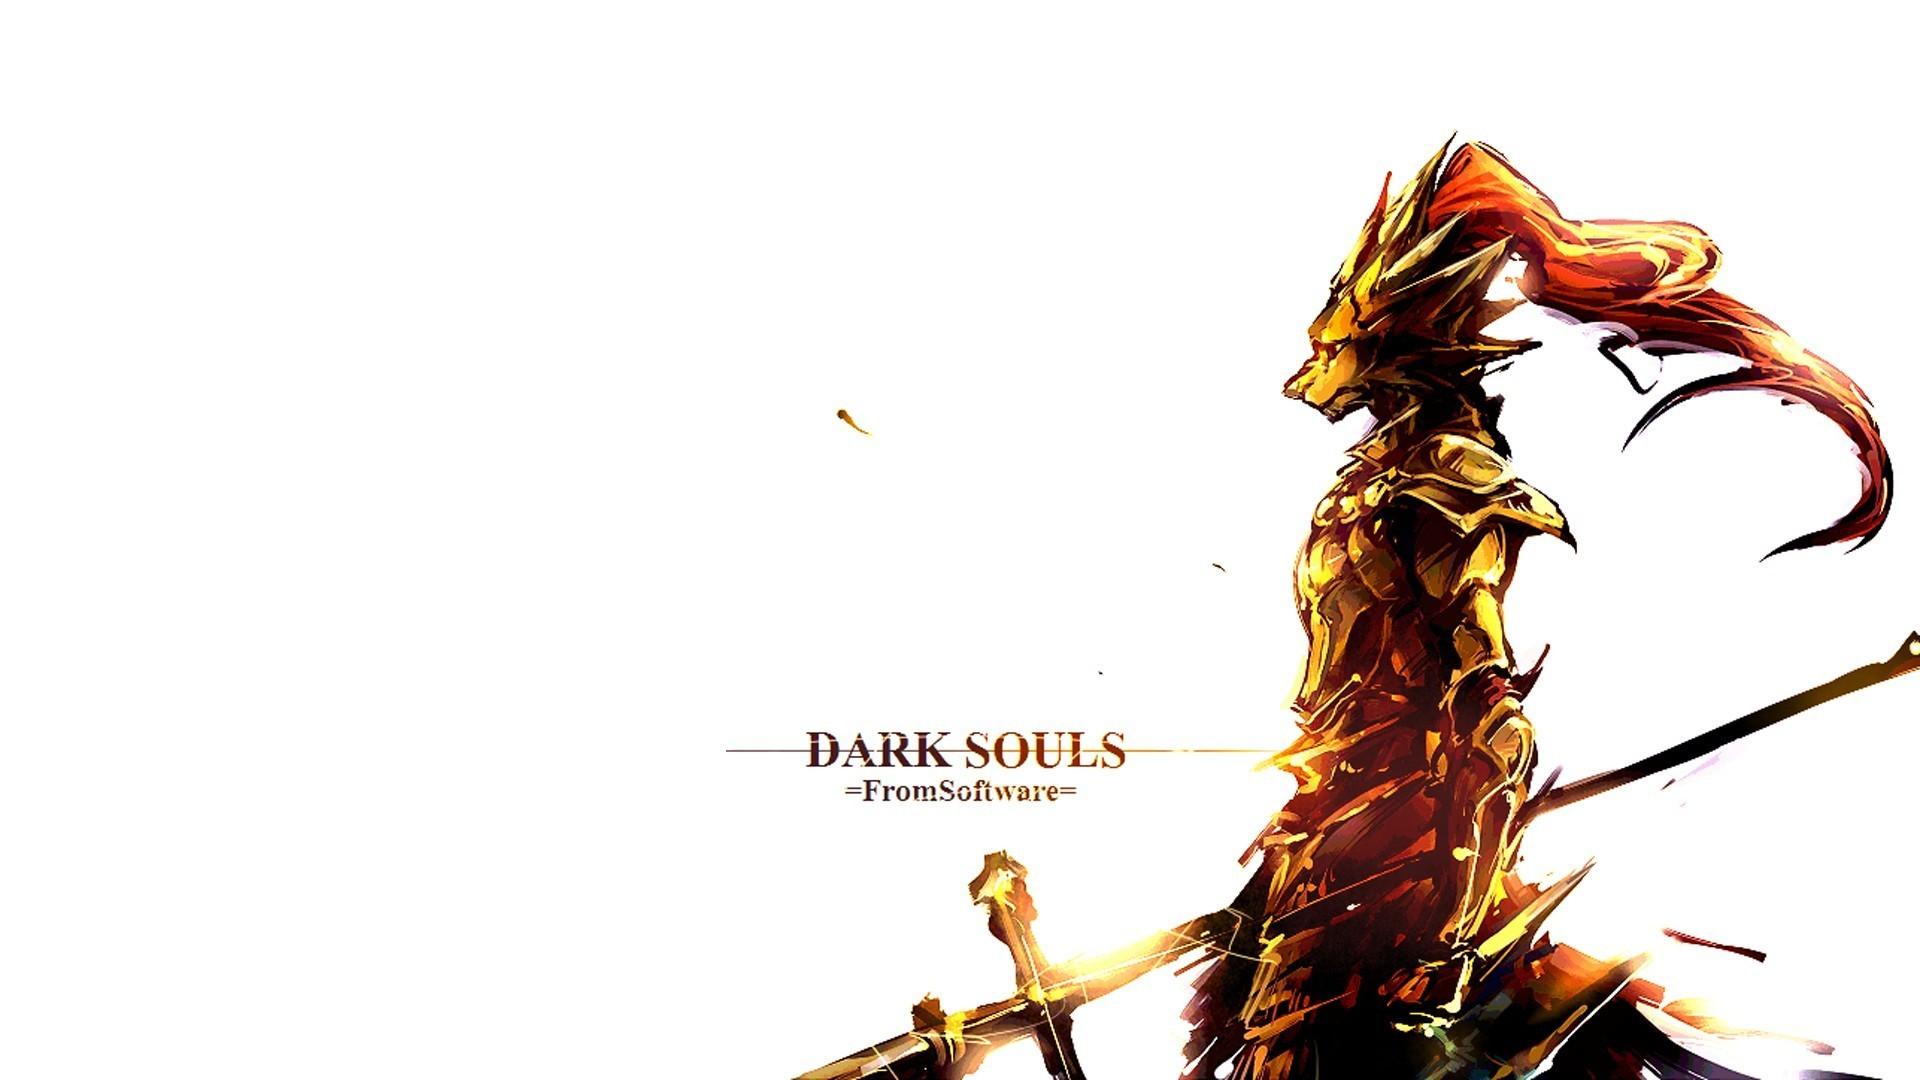 Dark Souls Warrior Games fantasy wallpaper 1920x1080 195701 1920x1080